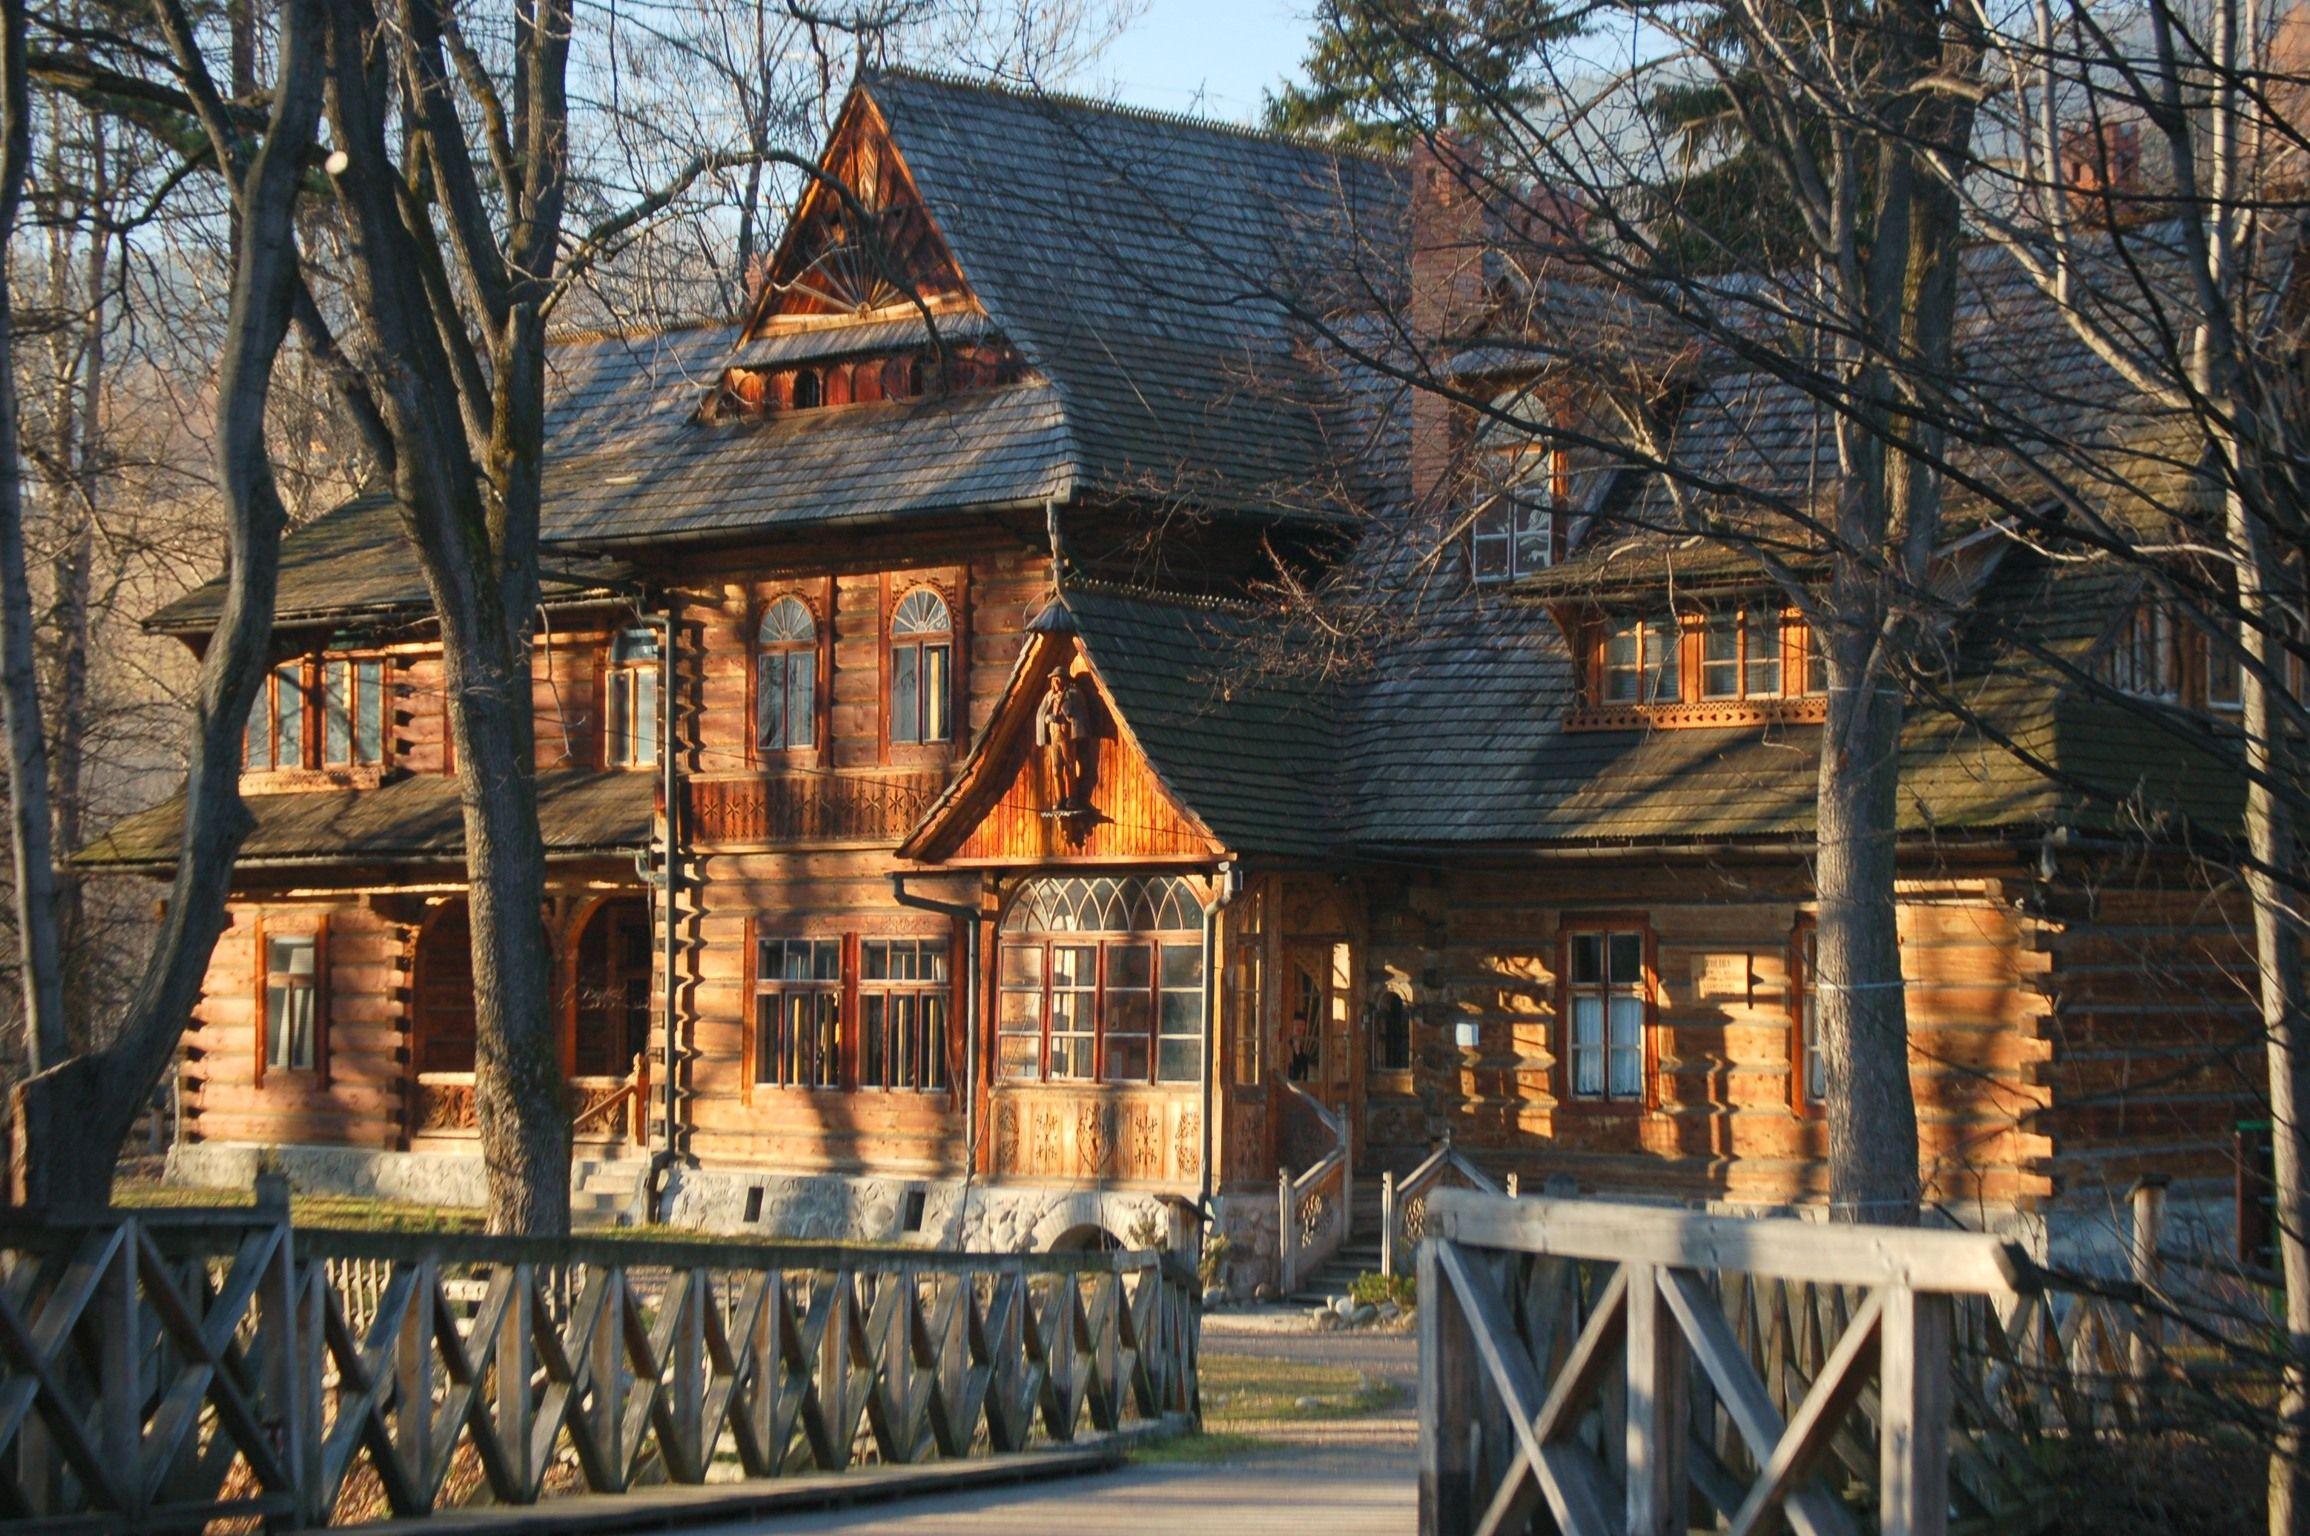 Cute wooden house in Zakopane